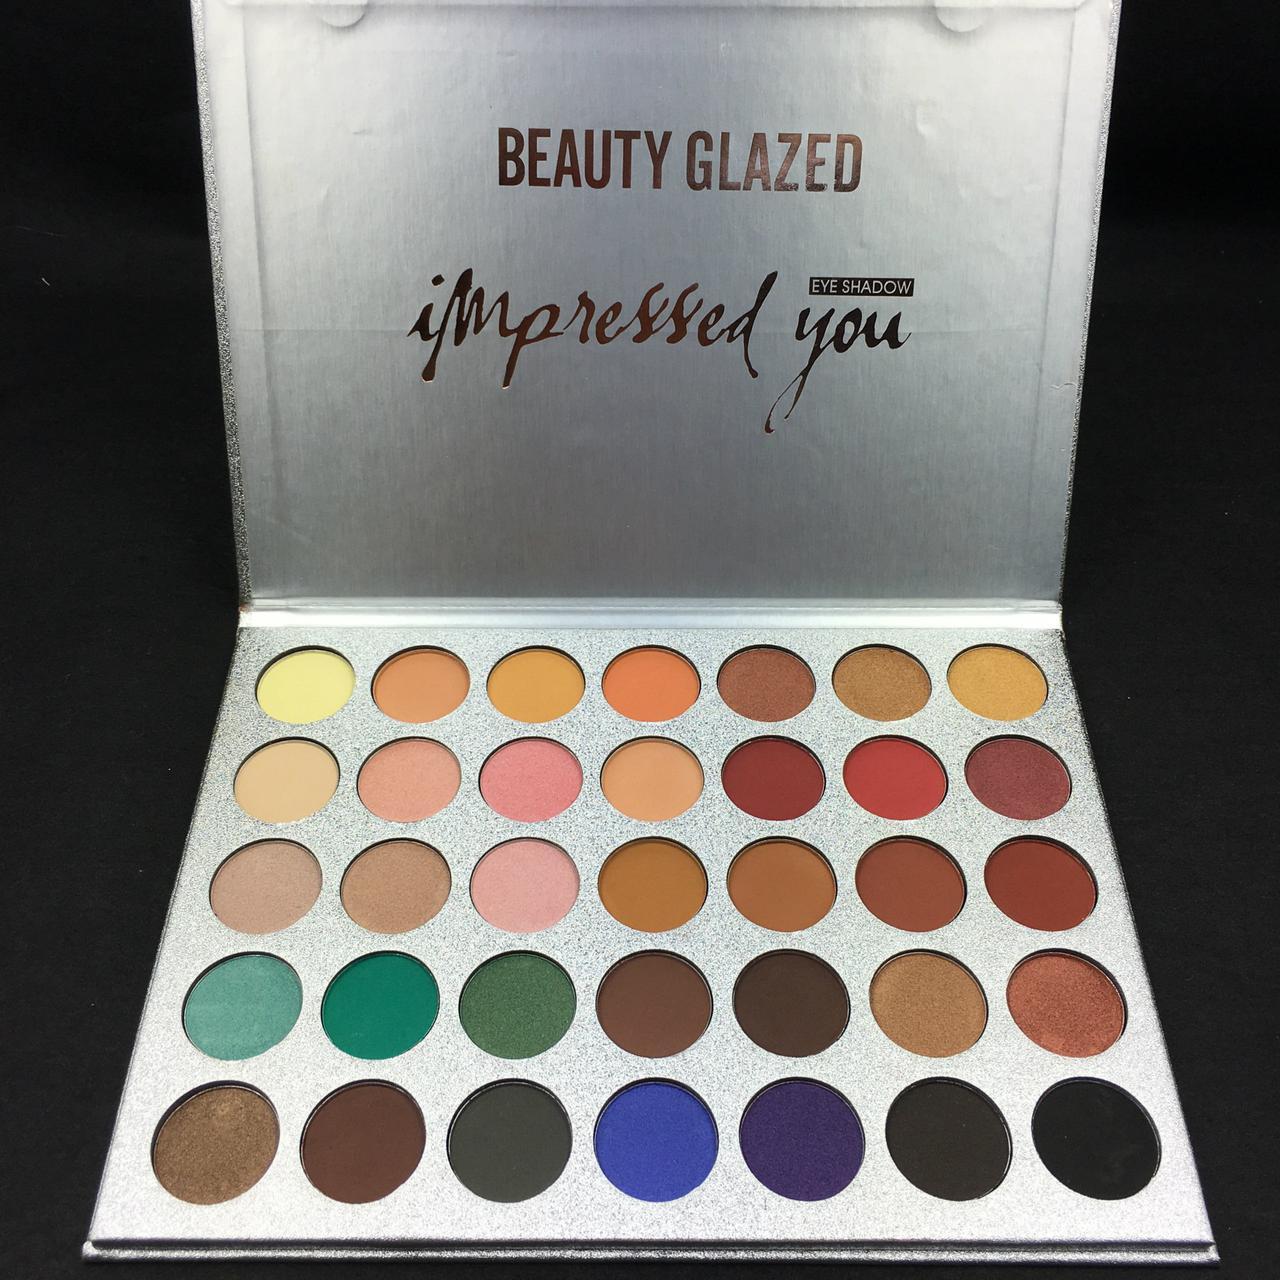 Набор из 35 теней Beauty glazed impressed you